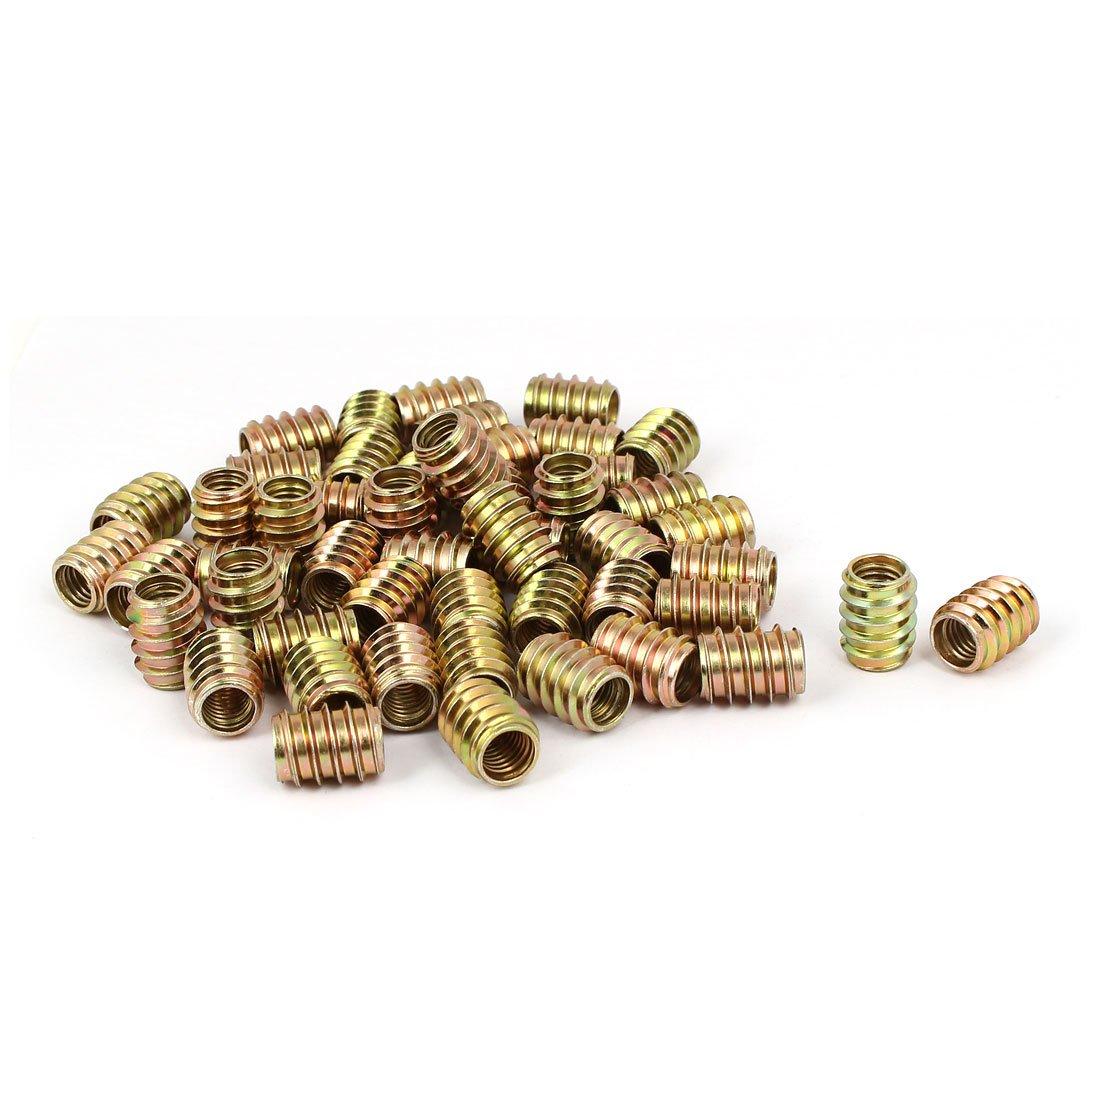 uxcell M8 x 17mm Wood Furniture Insert Screw E-Nut Bronze Tone 50pcs